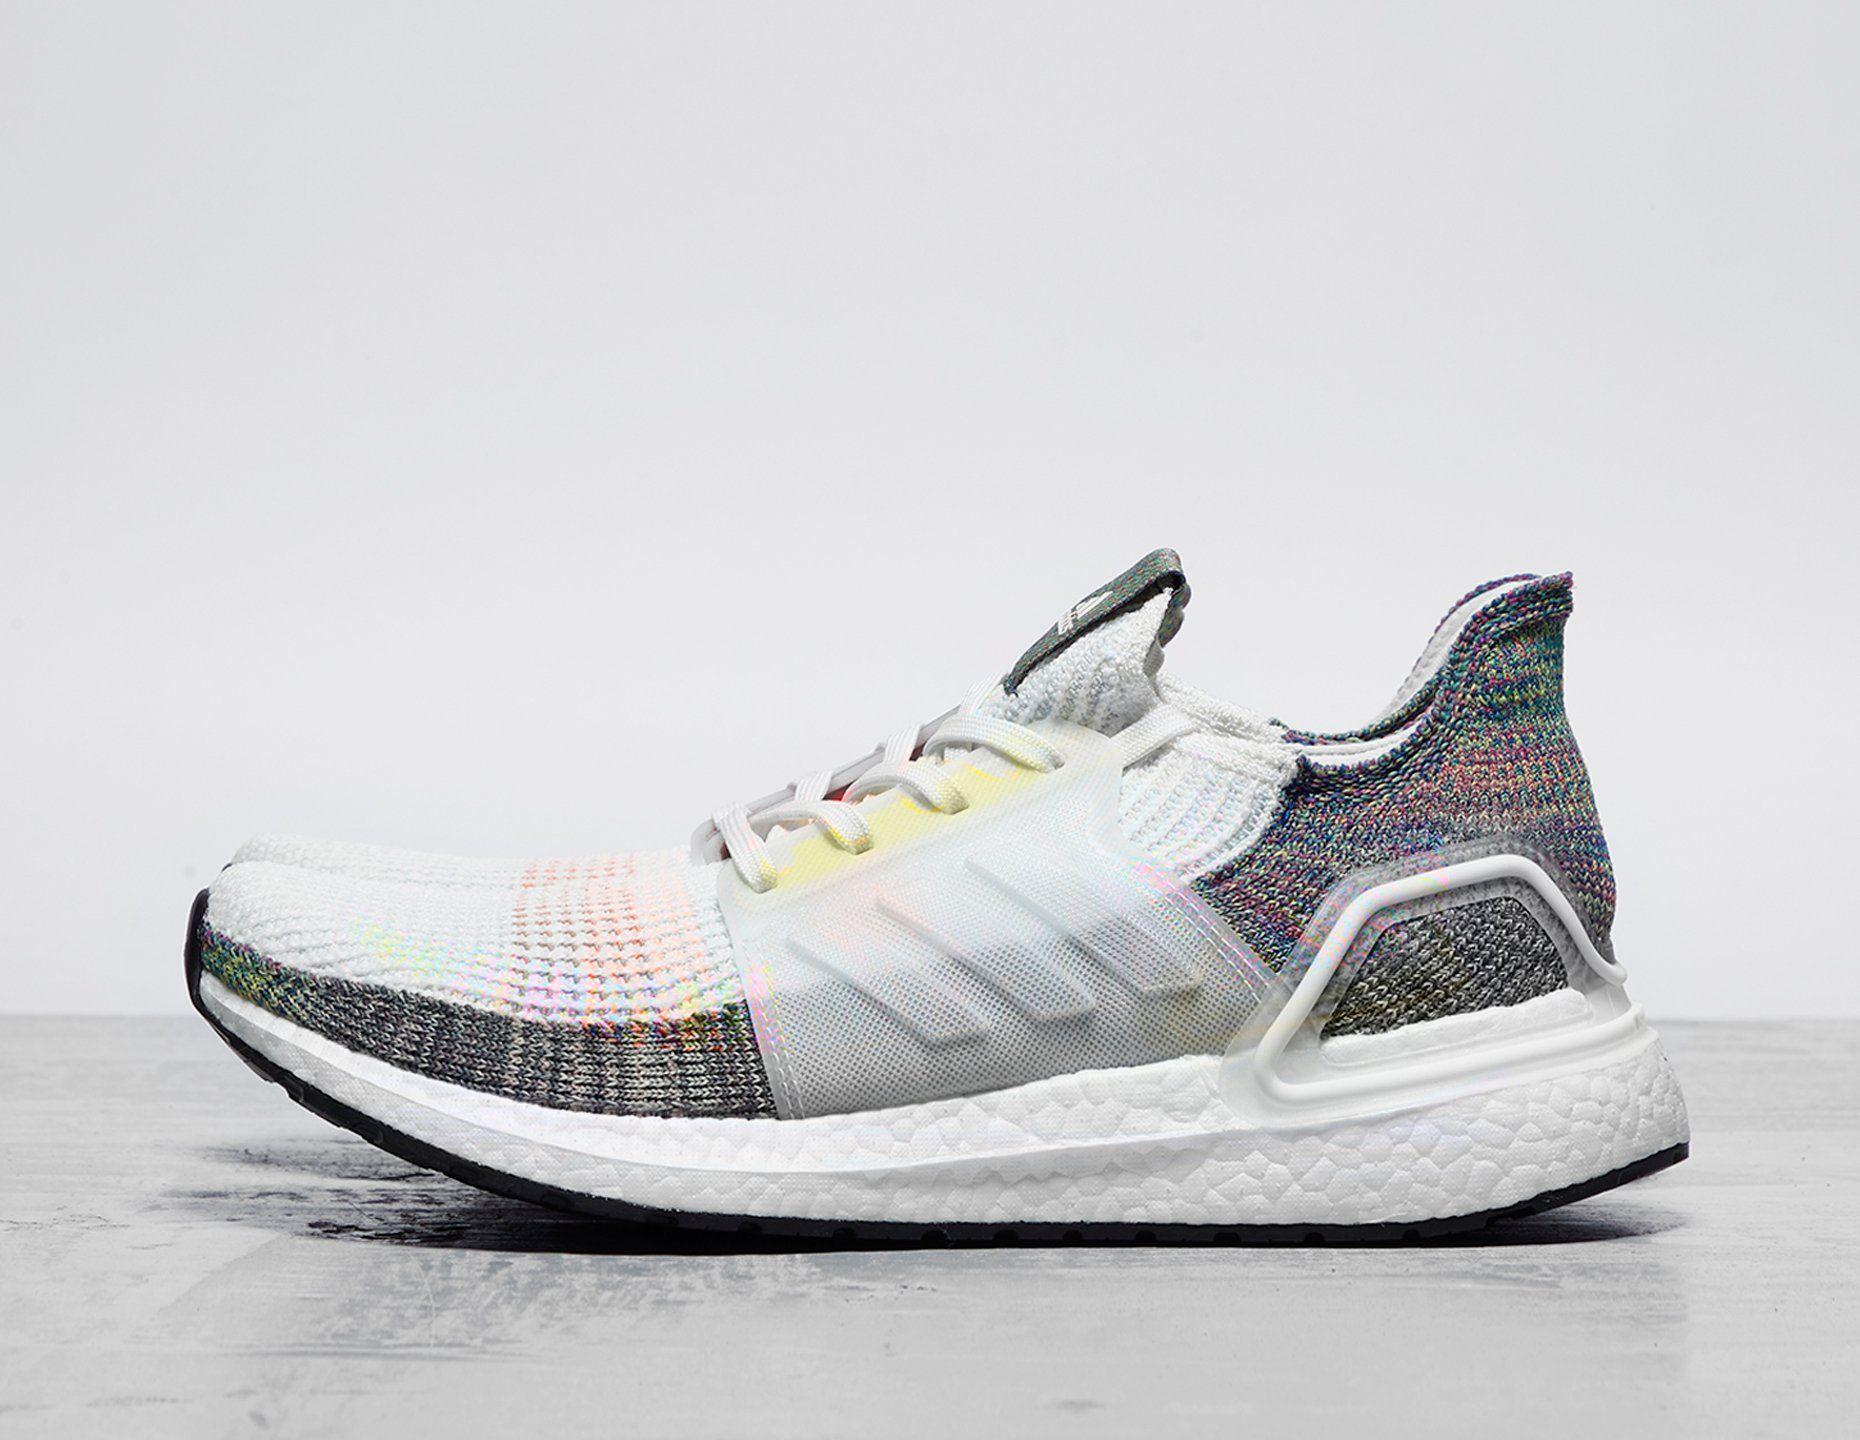 Adidas Ultra Boost 19 'Multi' Premium Contemporary